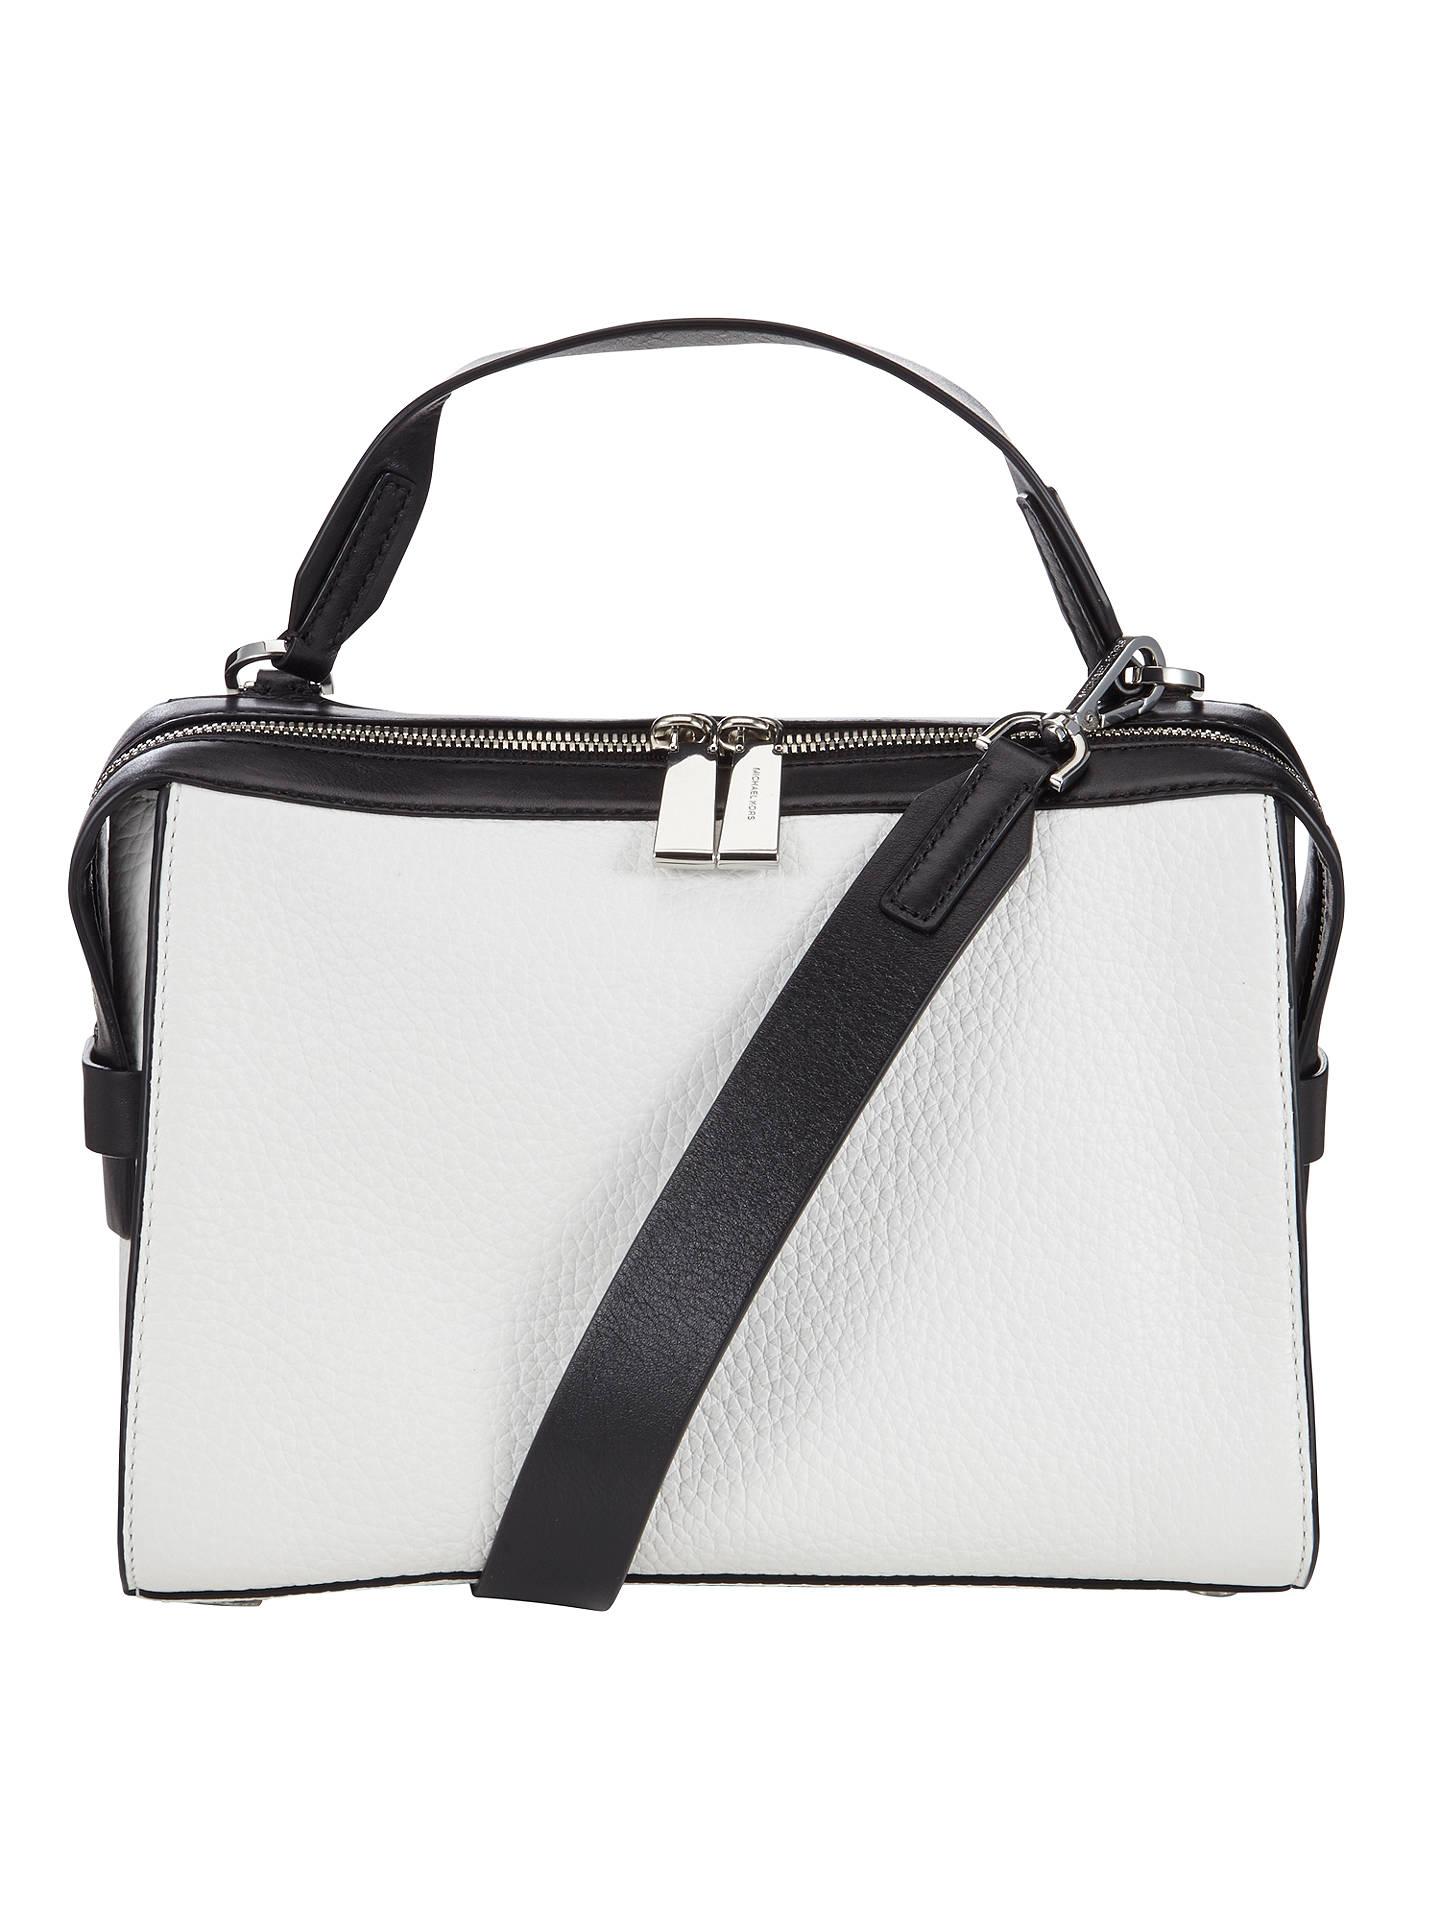 8860d5aa868e7d Buy MICHAEL Michael Kors Ingrid Medium Leather Shoulder Bag, White / Black  Online at johnlewis ...